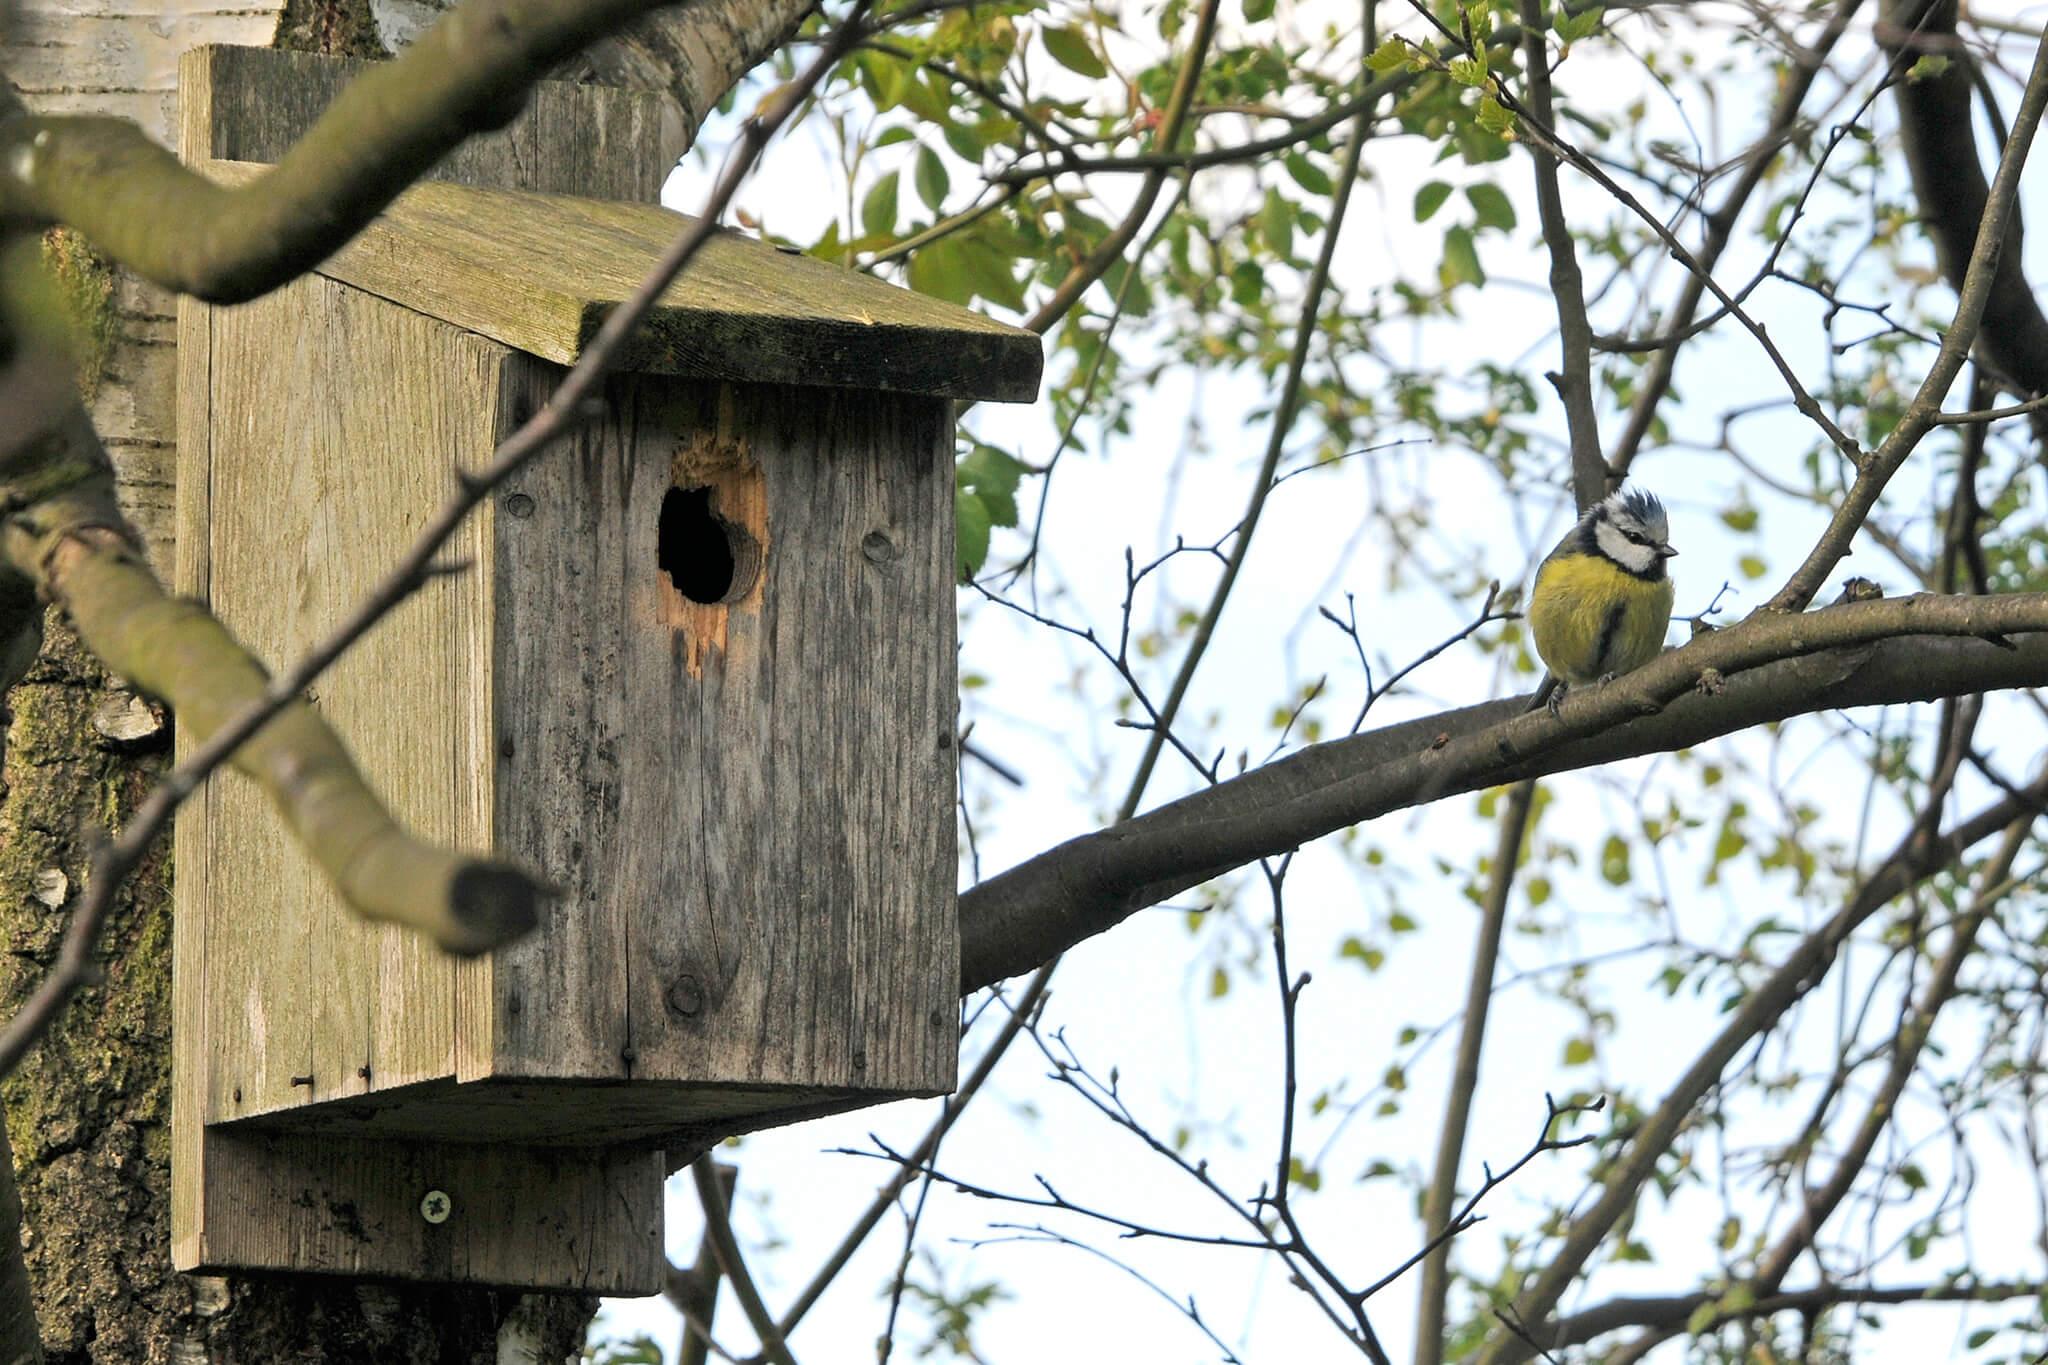 Wooden bird box